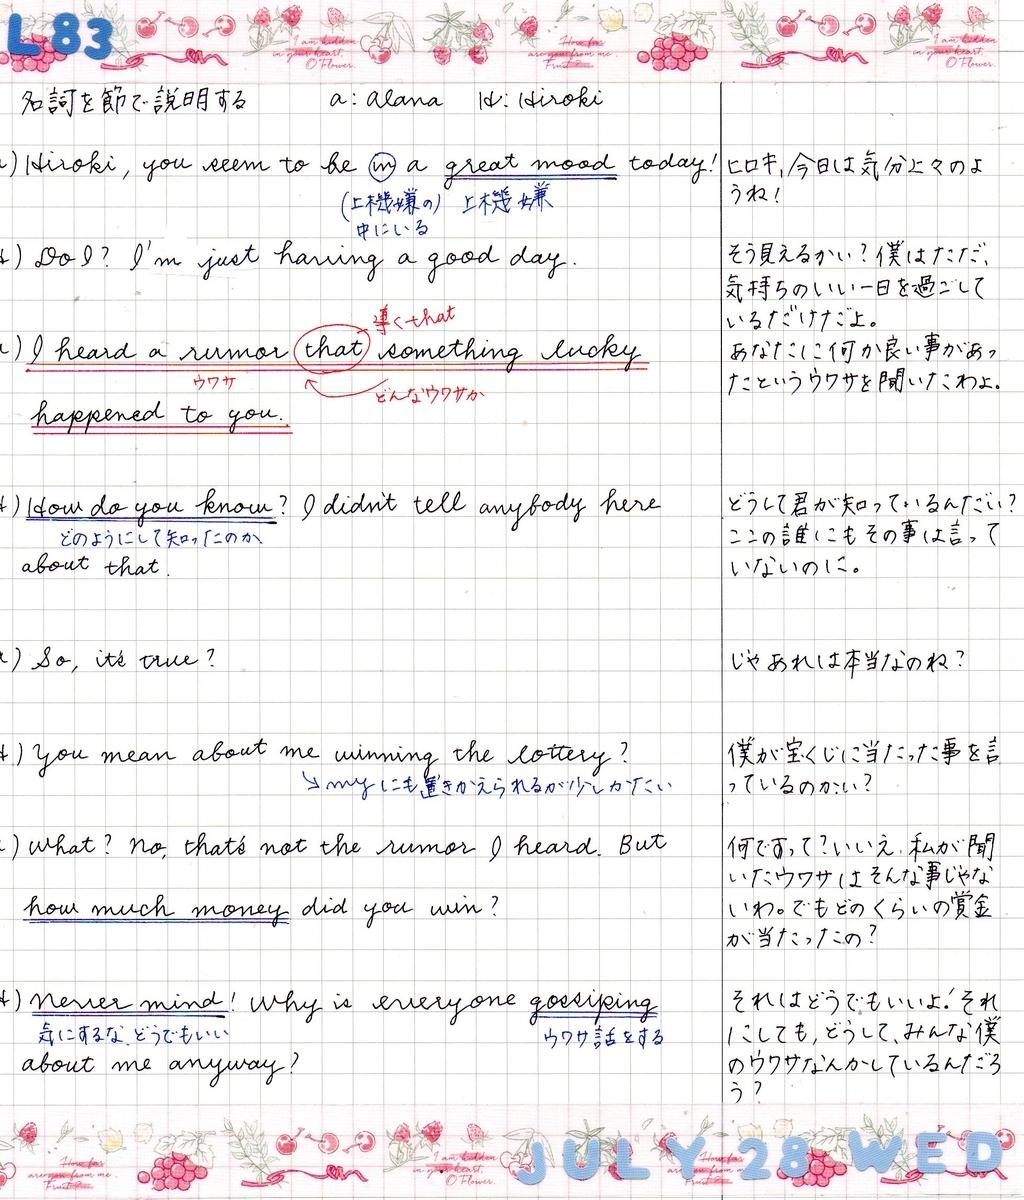 f:id:yuki-freestyle-sk8:20210803170610j:plain